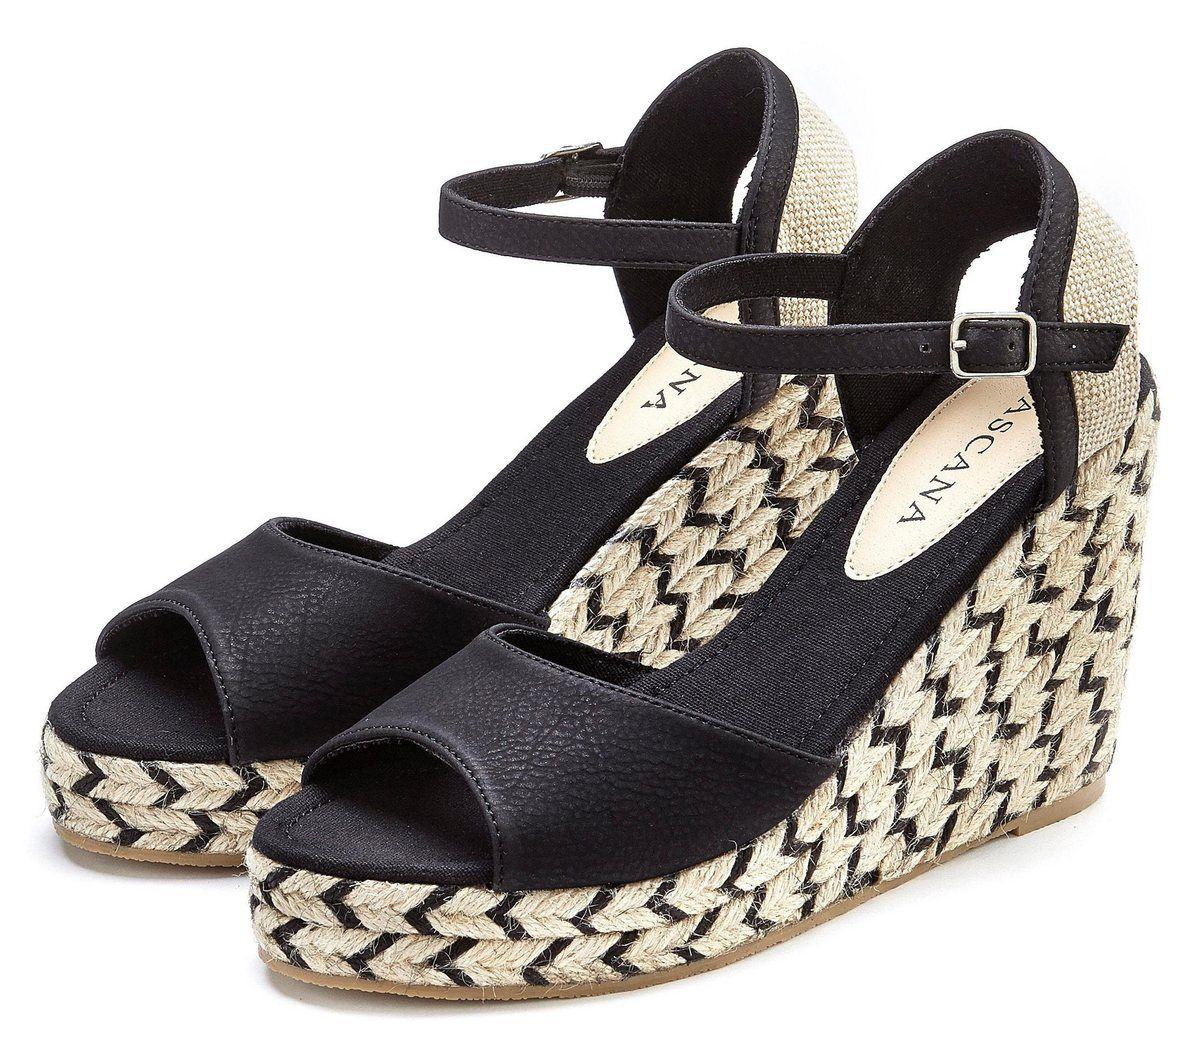 LASCANA High Heel Sandalette mit Keilabsatz im Ethno Look